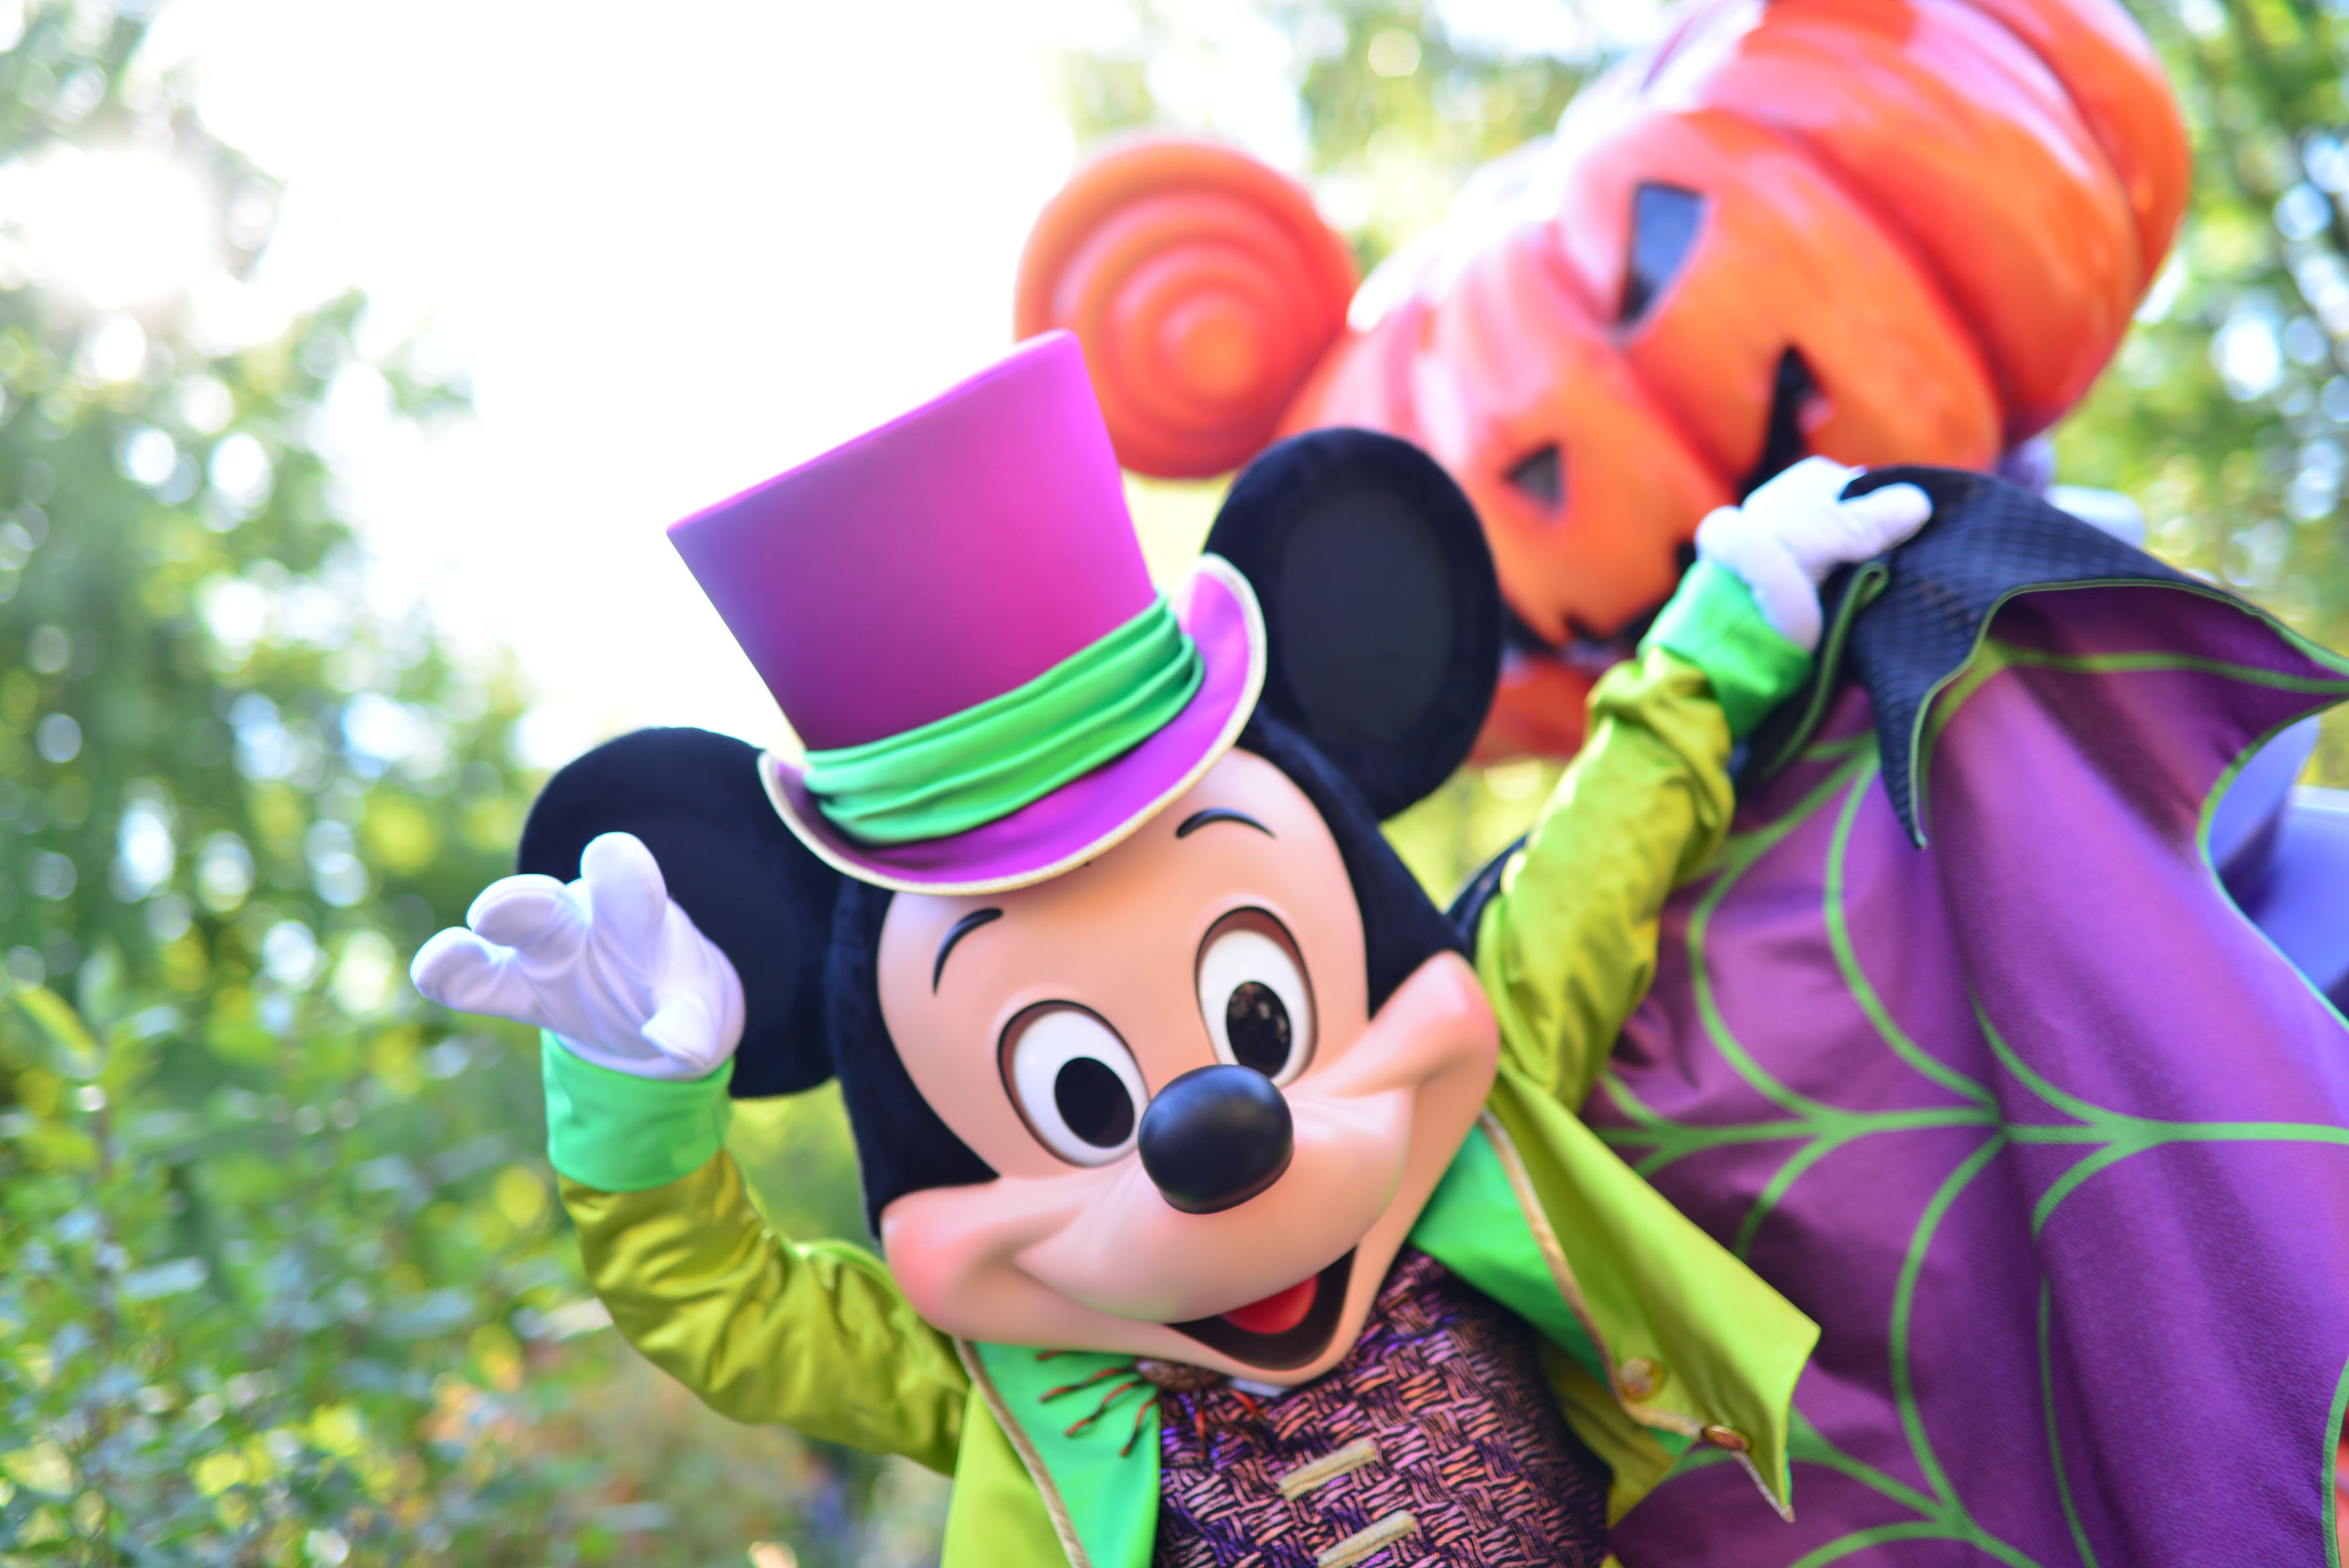 halloween 2016 at disneyland paris funny or spooky? – magical